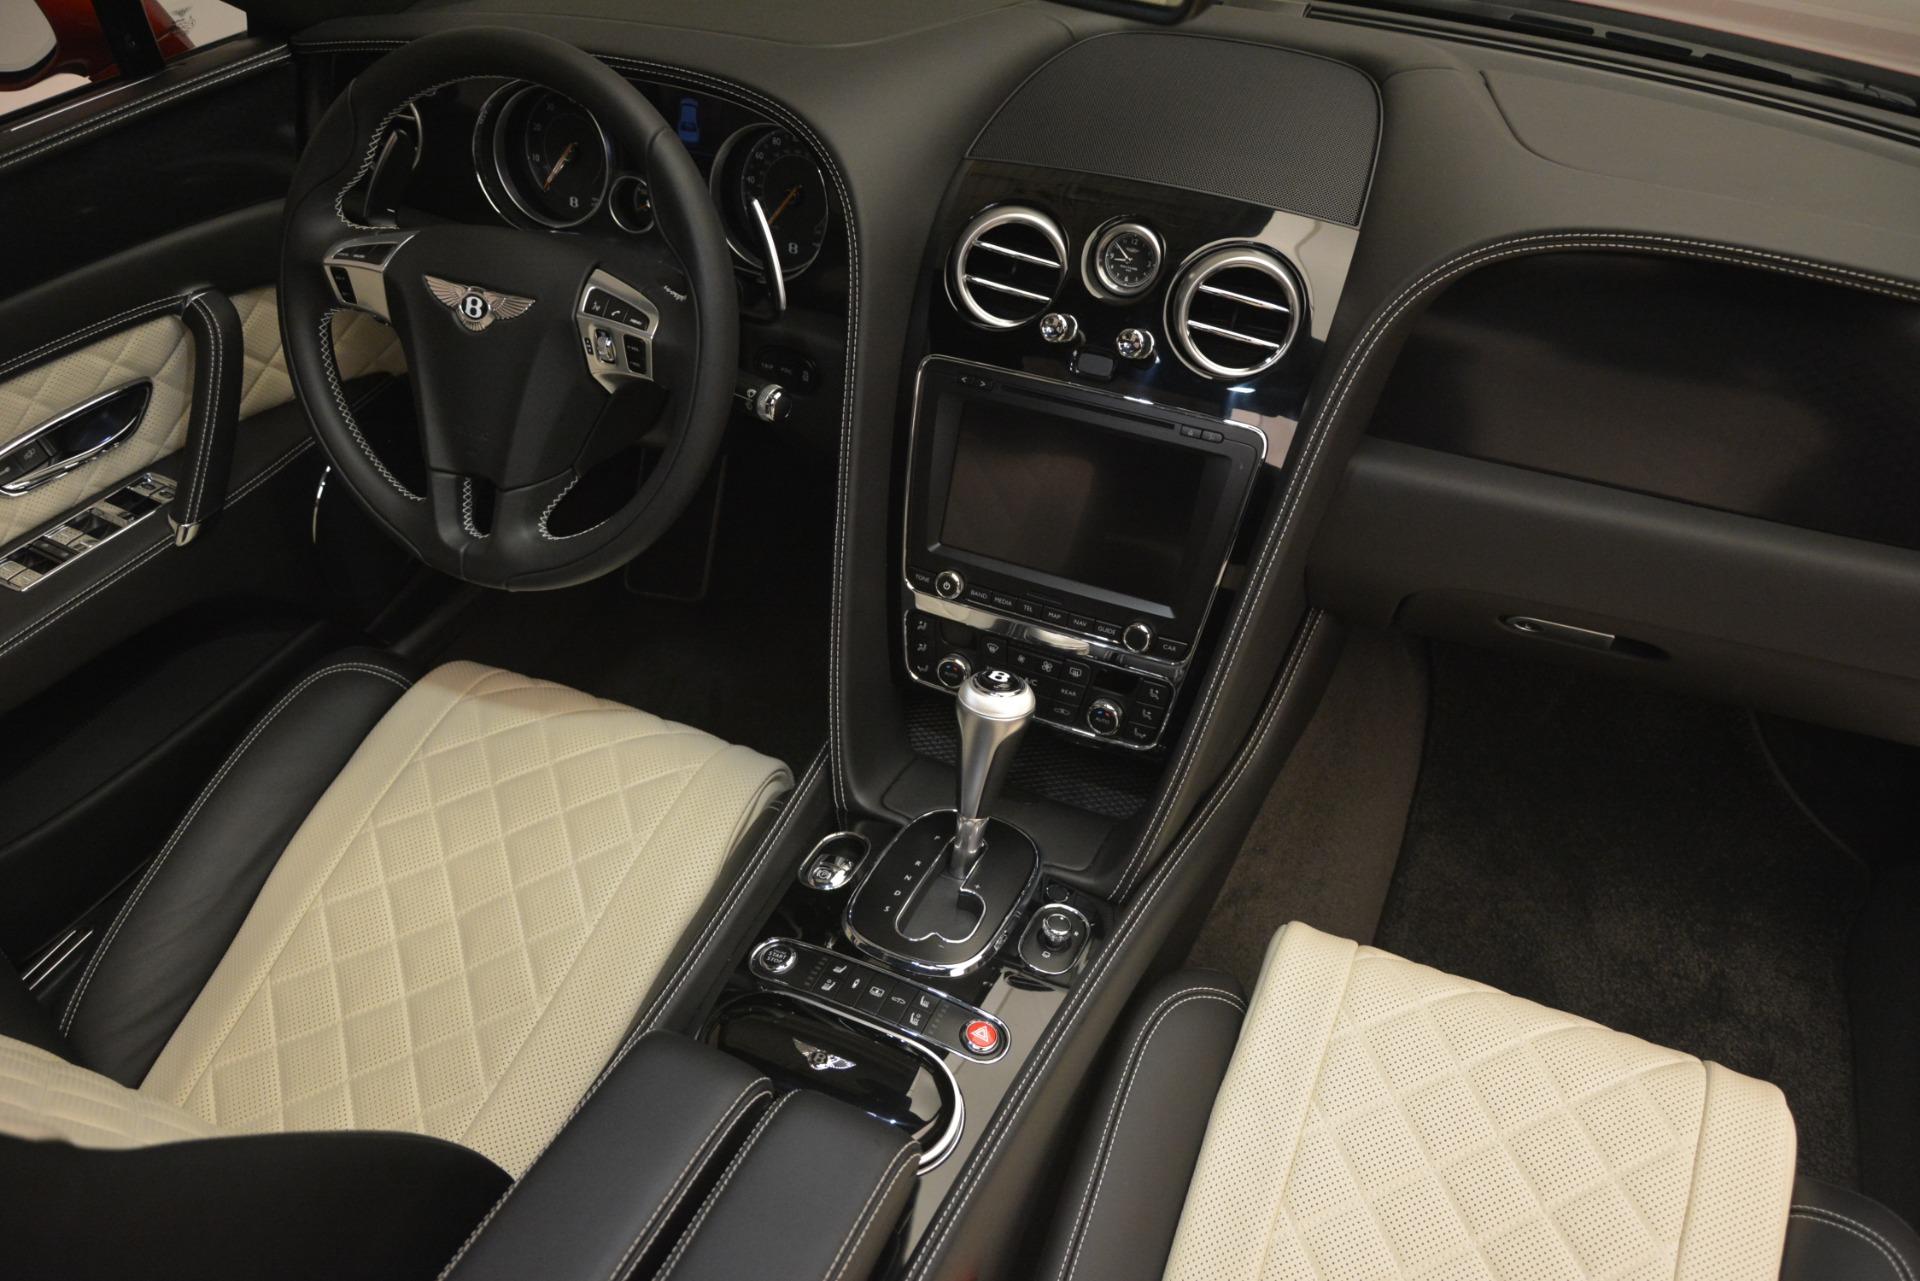 Used 2018 Bentley Flying Spur W12 S For Sale In Westport, CT 3014_p31